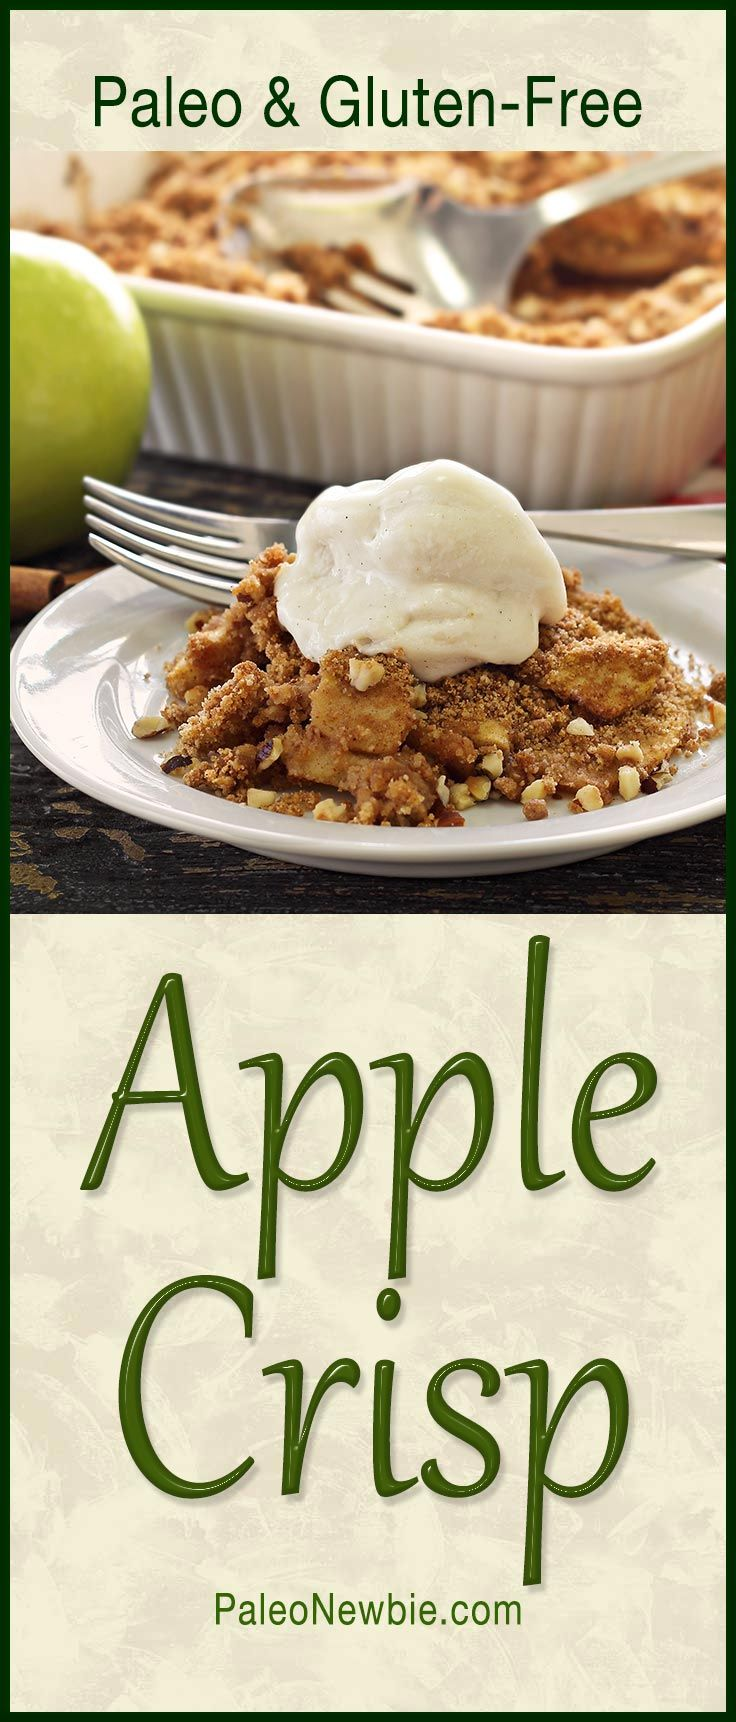 ... apple crisp dessert recipe is paleo, gluten-free, and so good! #paleo